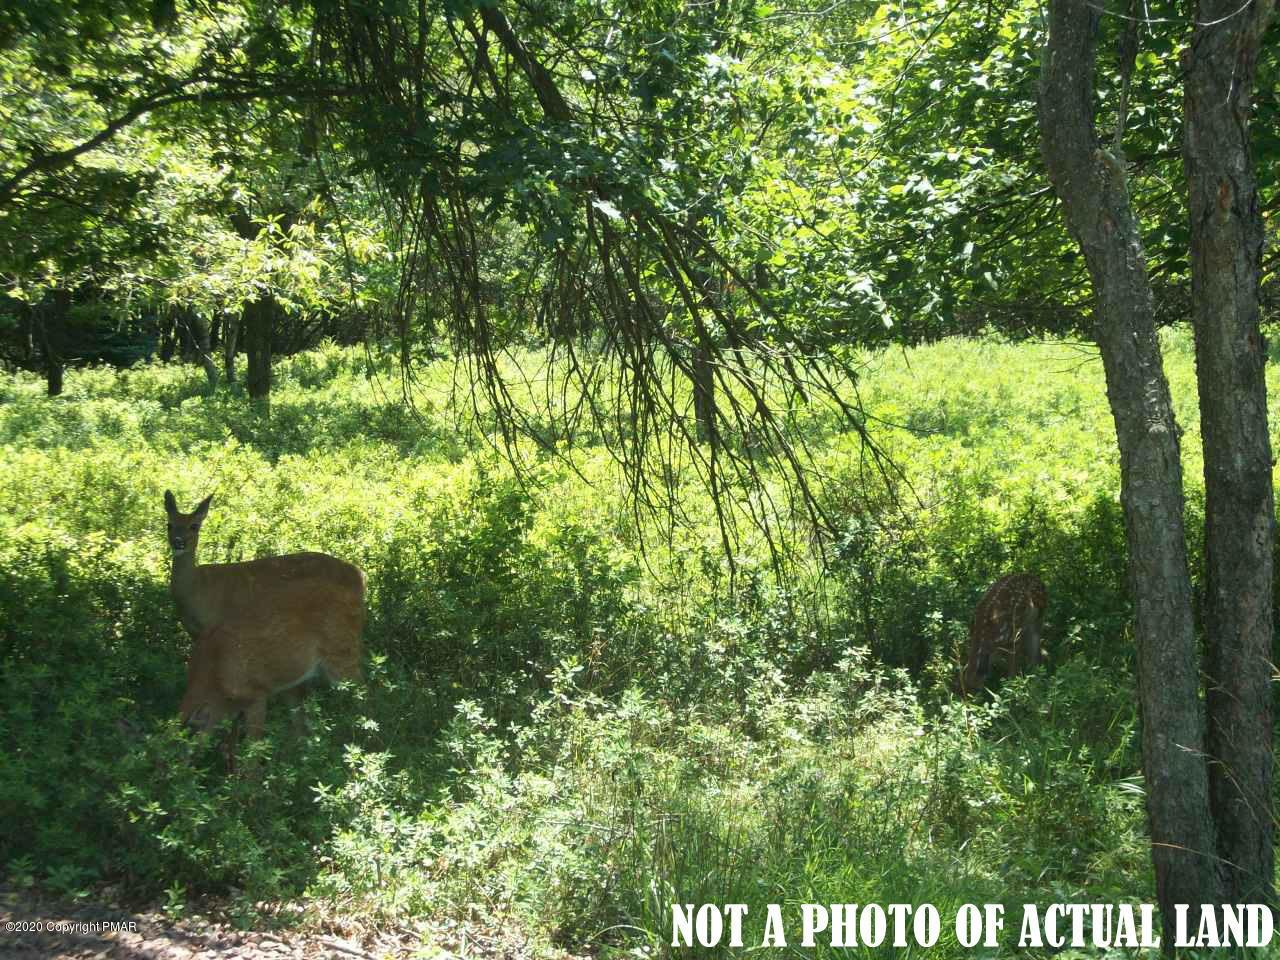 PENDING!!!! C1239 Crane Road, Albrightsville, PA, 18210 United States